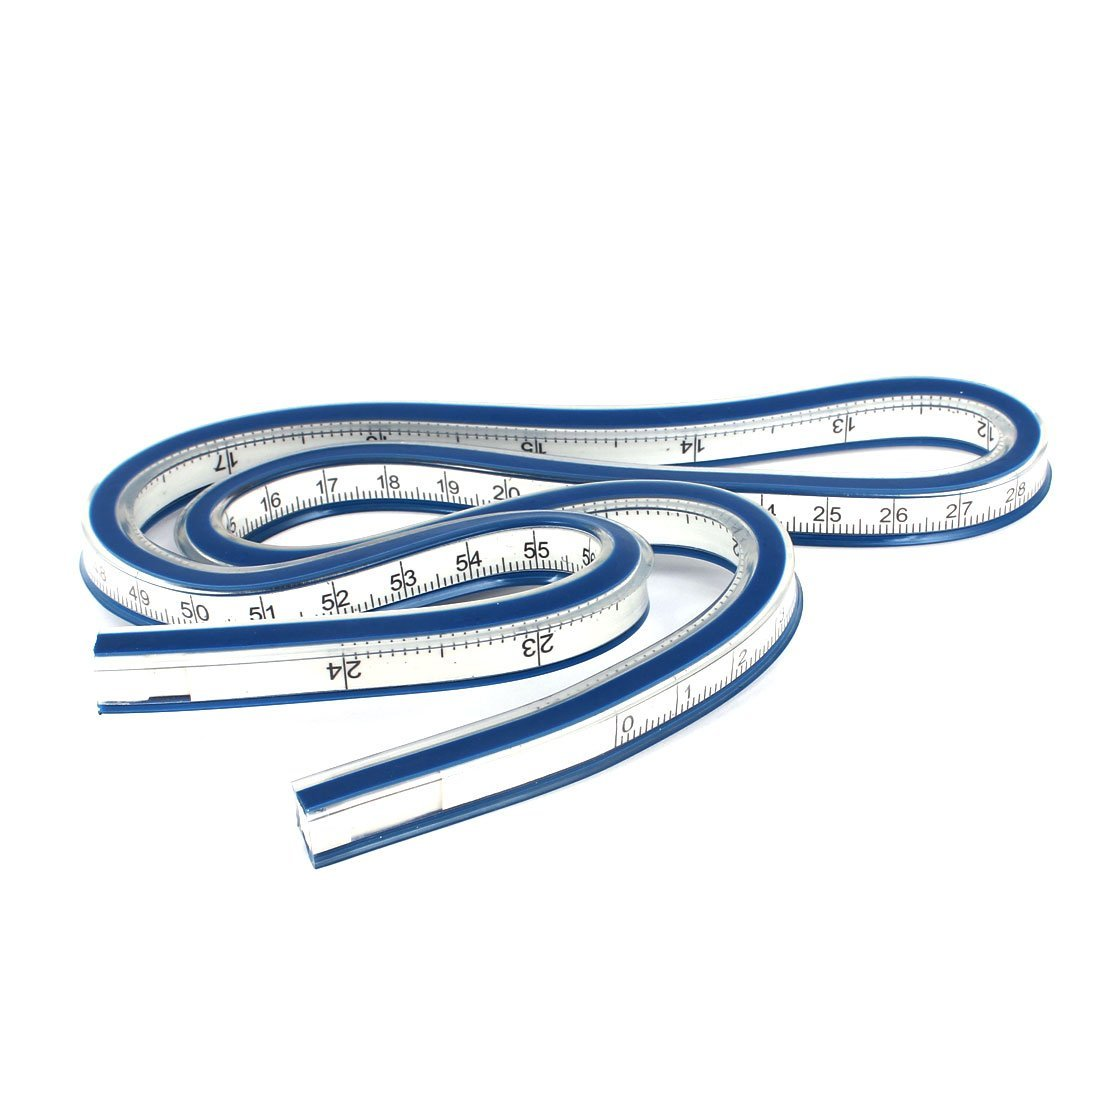 Affordable Wholesales 10pcs Carpenter Schneider Soft Plastic 60 Cm 24 Zoll Flexible Curve Ruler Blue + White